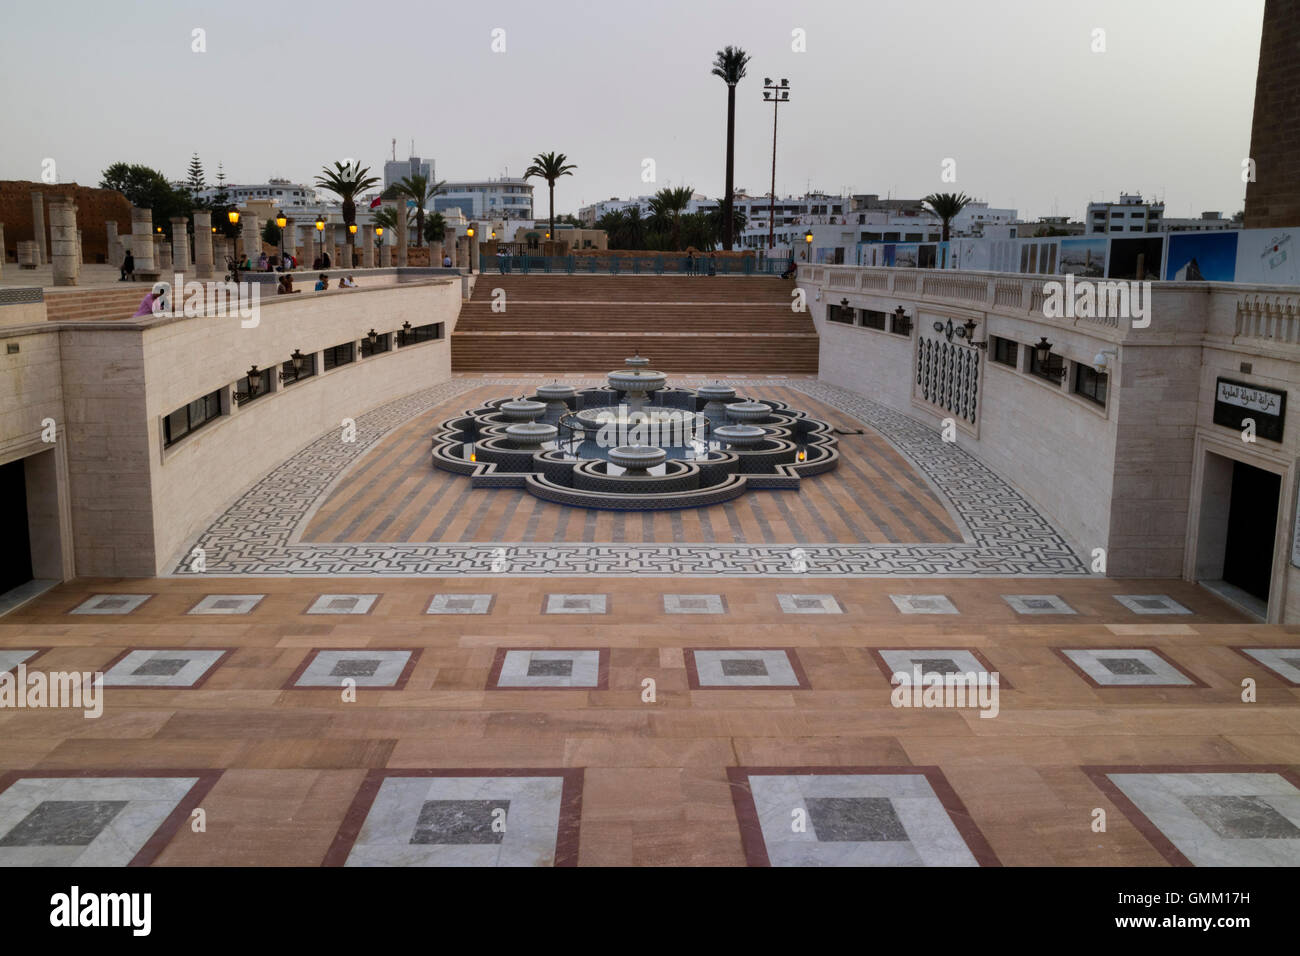 Platz in der Nähe der Hassan-Turm, Rabat, Marokko Stockbild